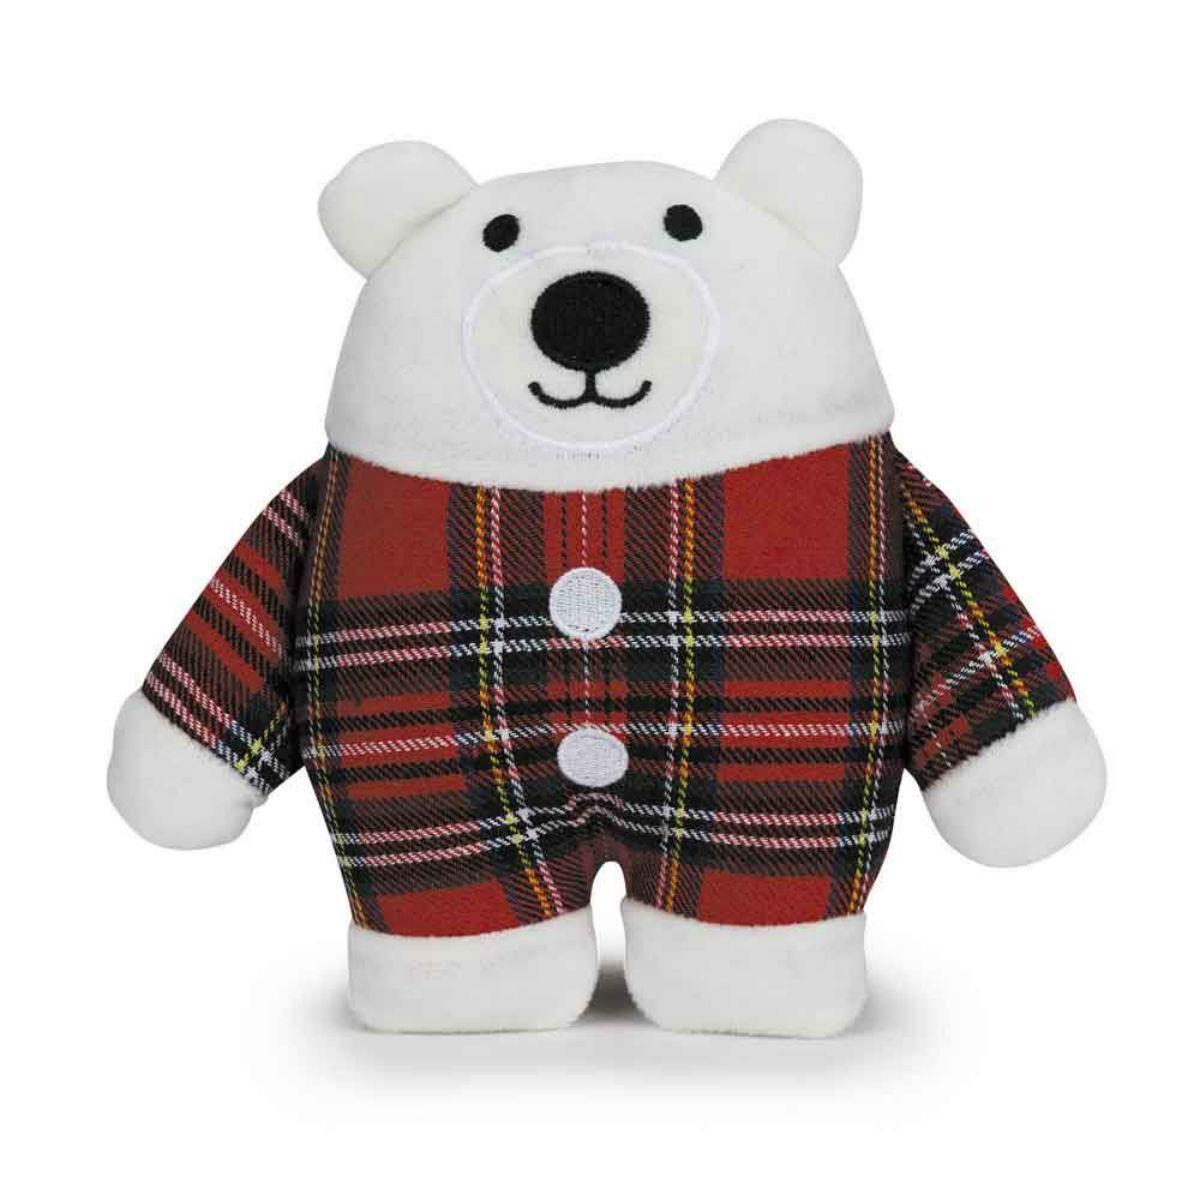 Zanies Holiday Tartan Friend Dog Toy - Polar Bear